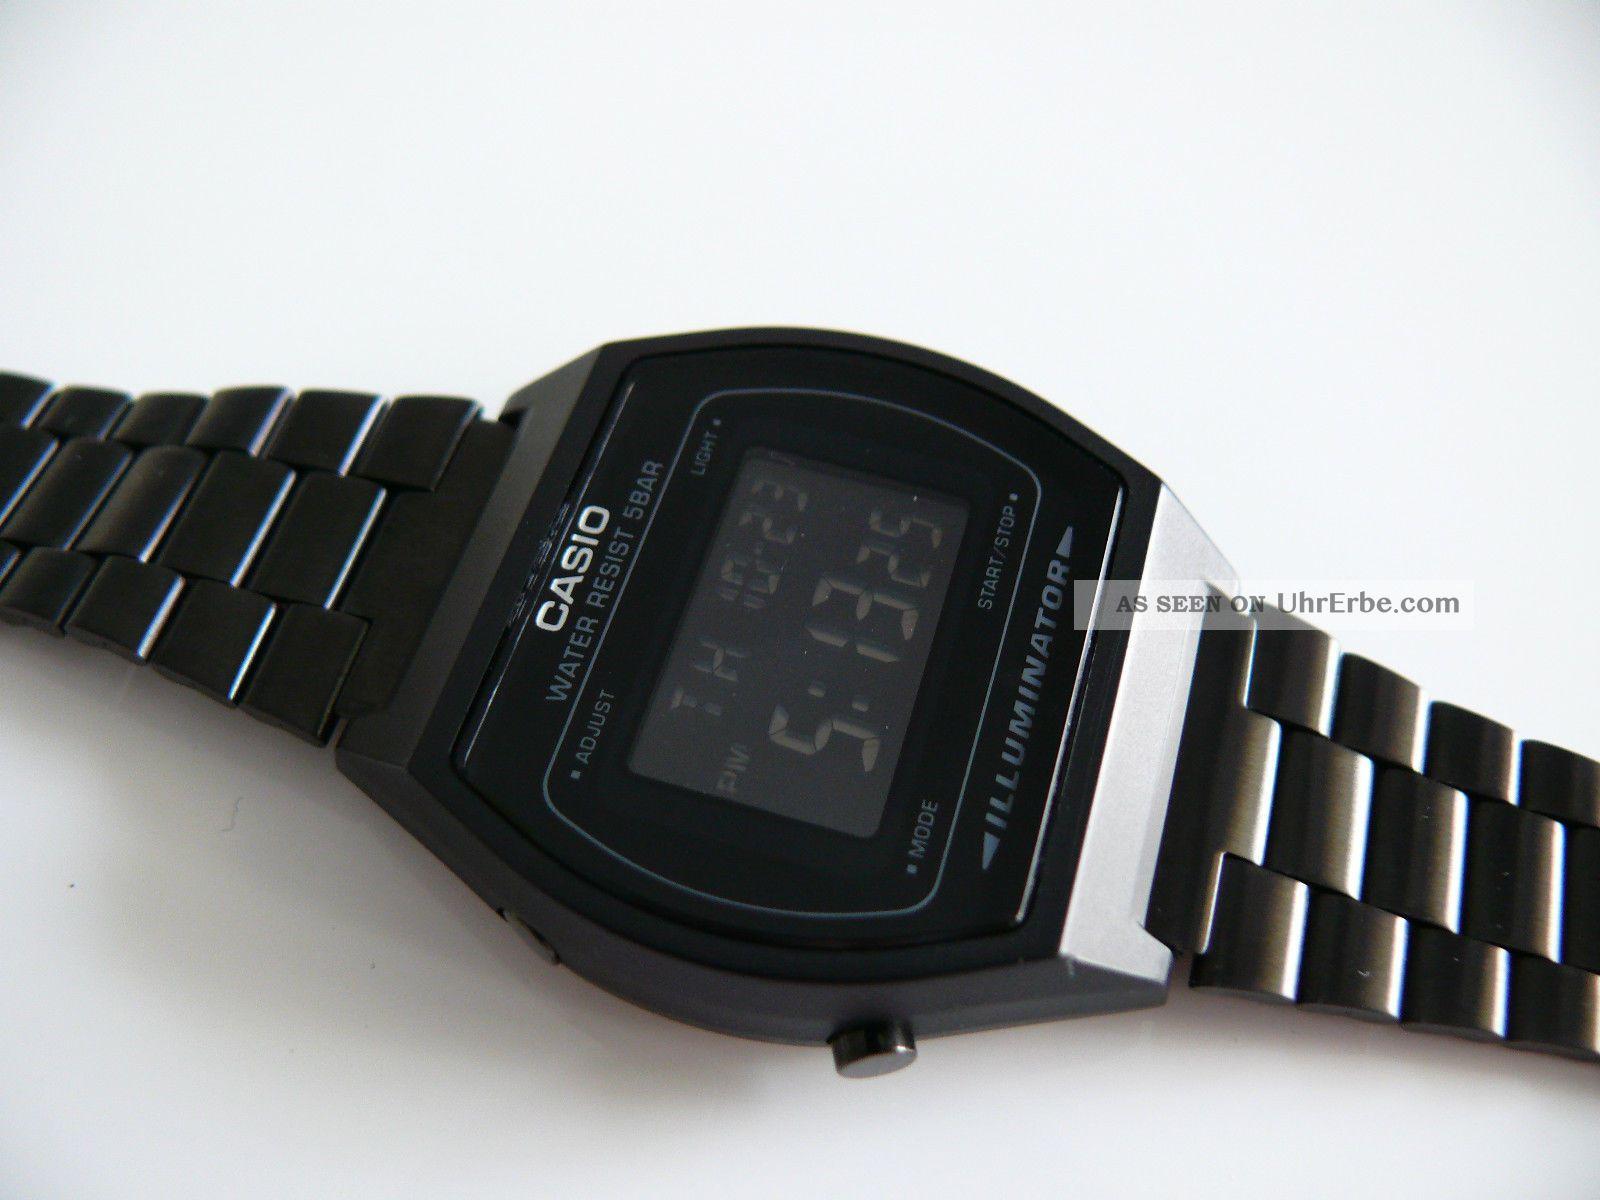 casio b 640w 3294 schwarz led herren armbanduhr watch. Black Bedroom Furniture Sets. Home Design Ideas